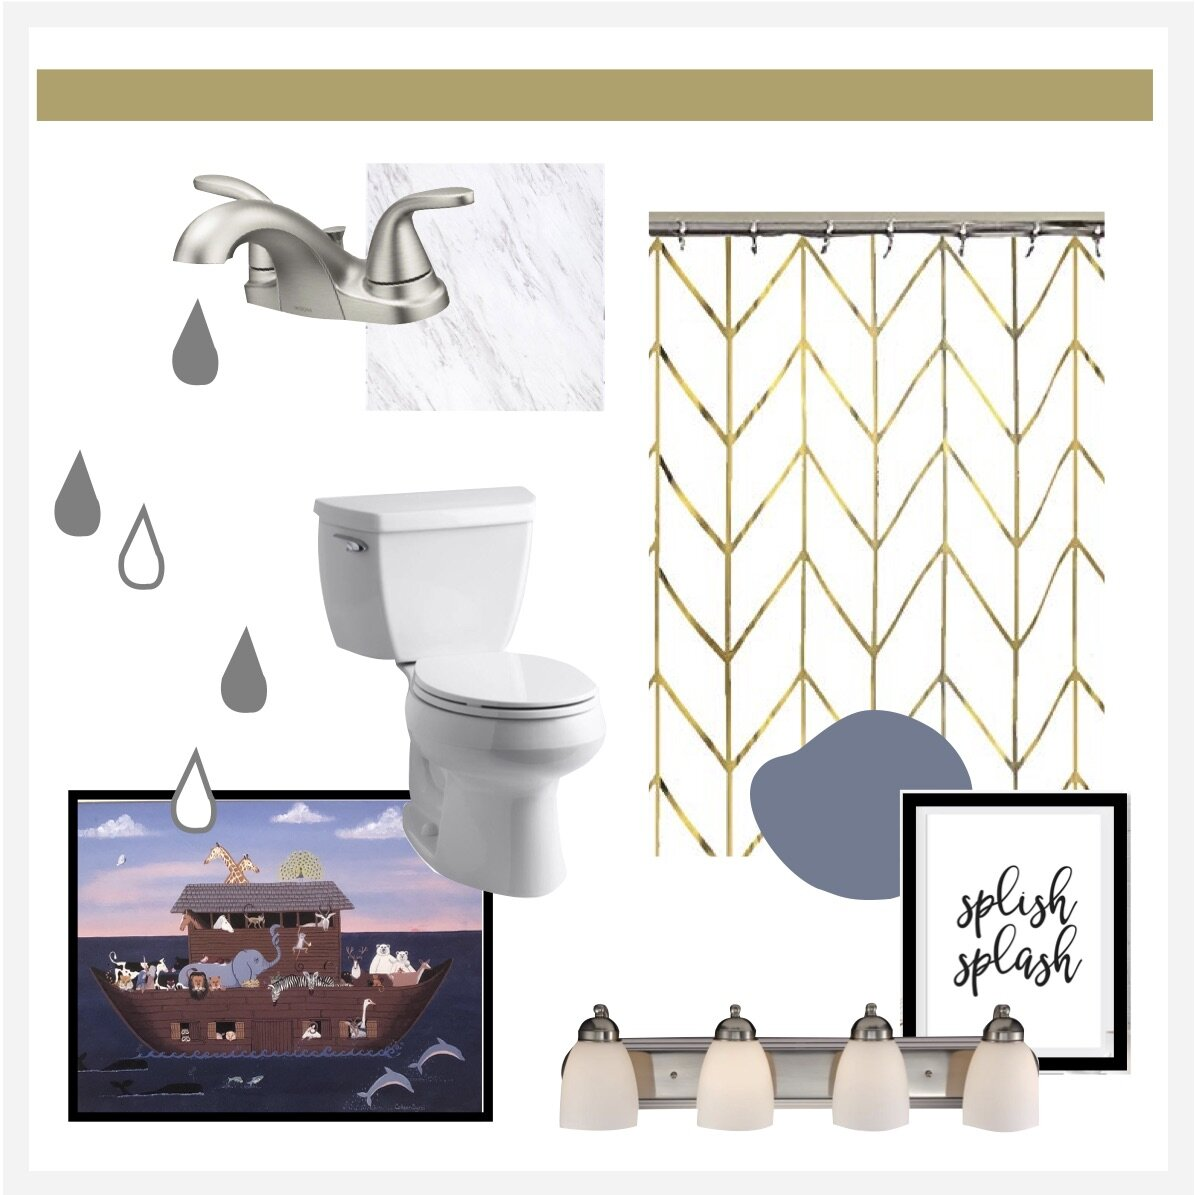 One Room Challenge, Wk 2: My Boys' Bathroom- Mood Board & Design Plans